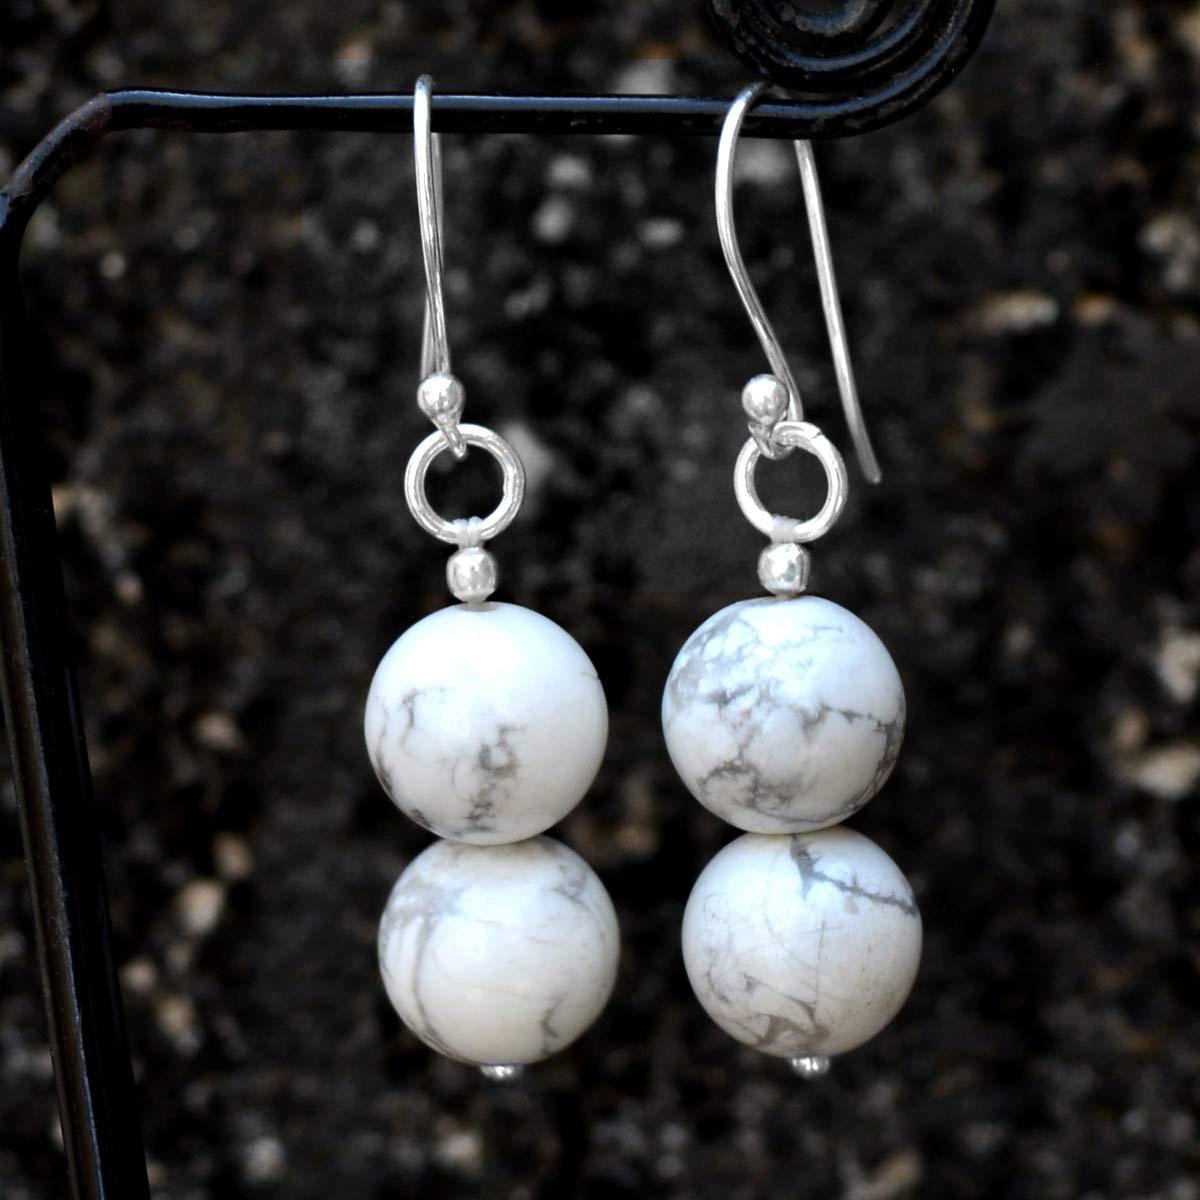 Dangle Earring Jaipur Rajasthan India Handmade Jewelry Manufacturer Beaded 10mm Howlite 2 Stone Set 925 Sterling Silver